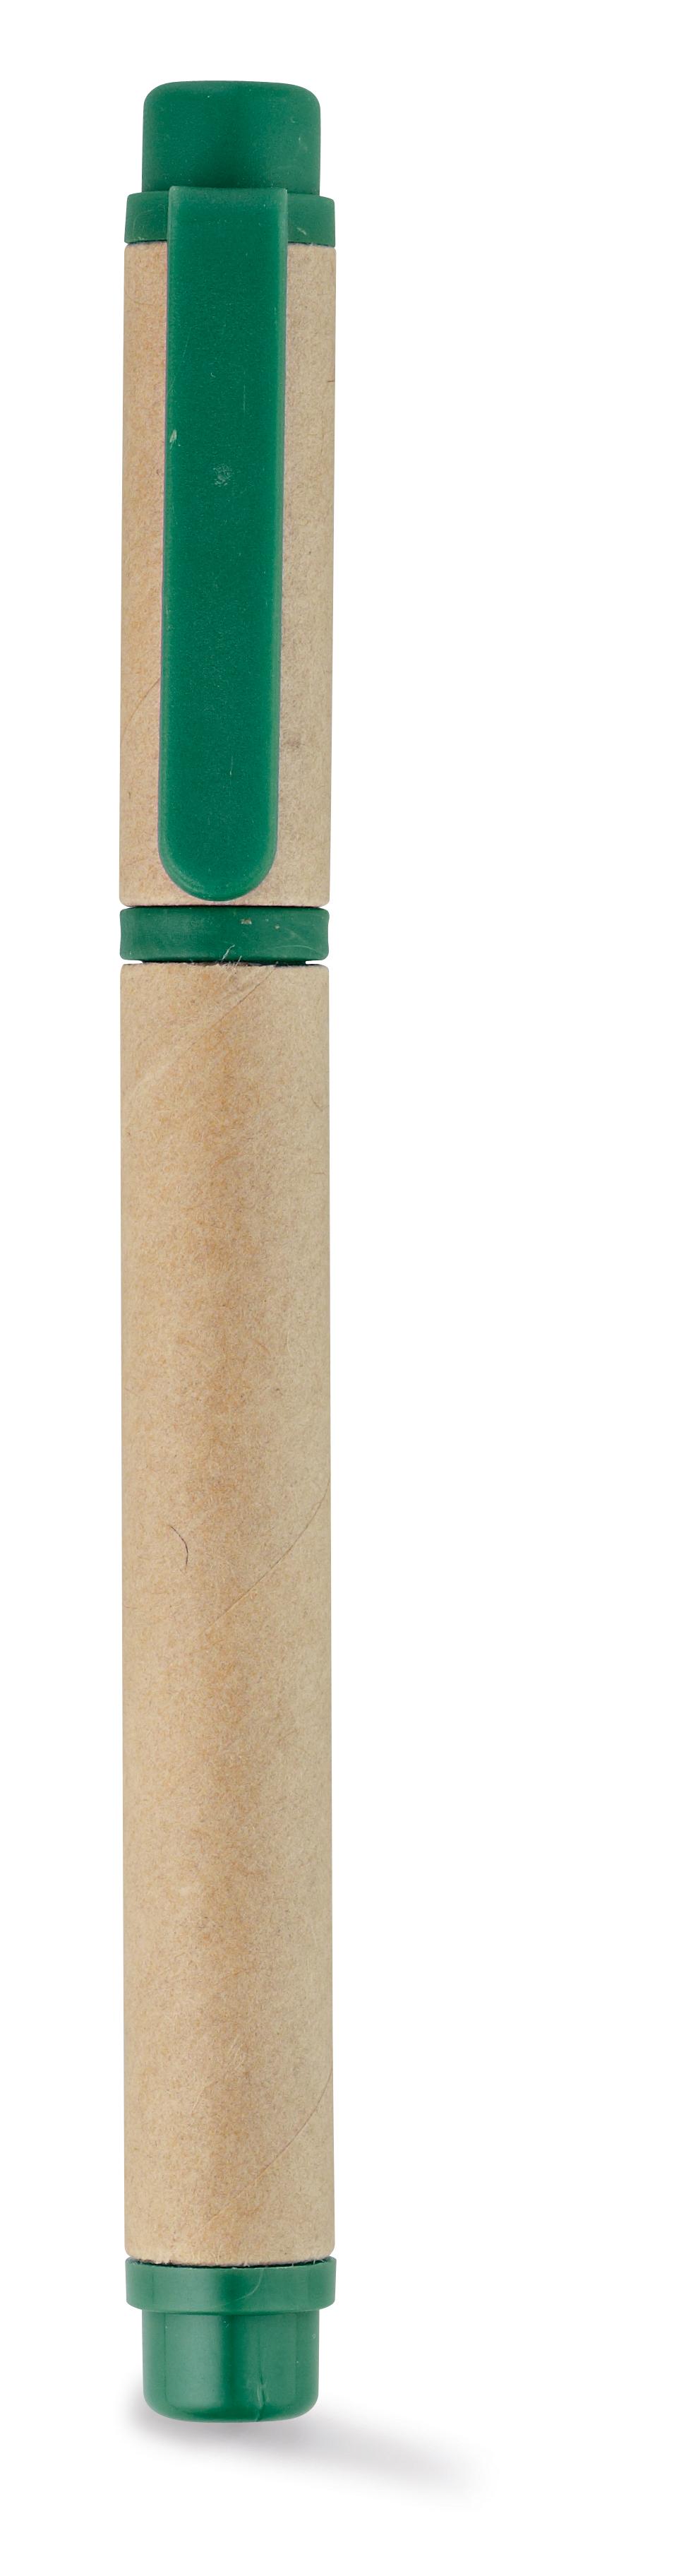 Casek Ball Pen Product Code GP91470